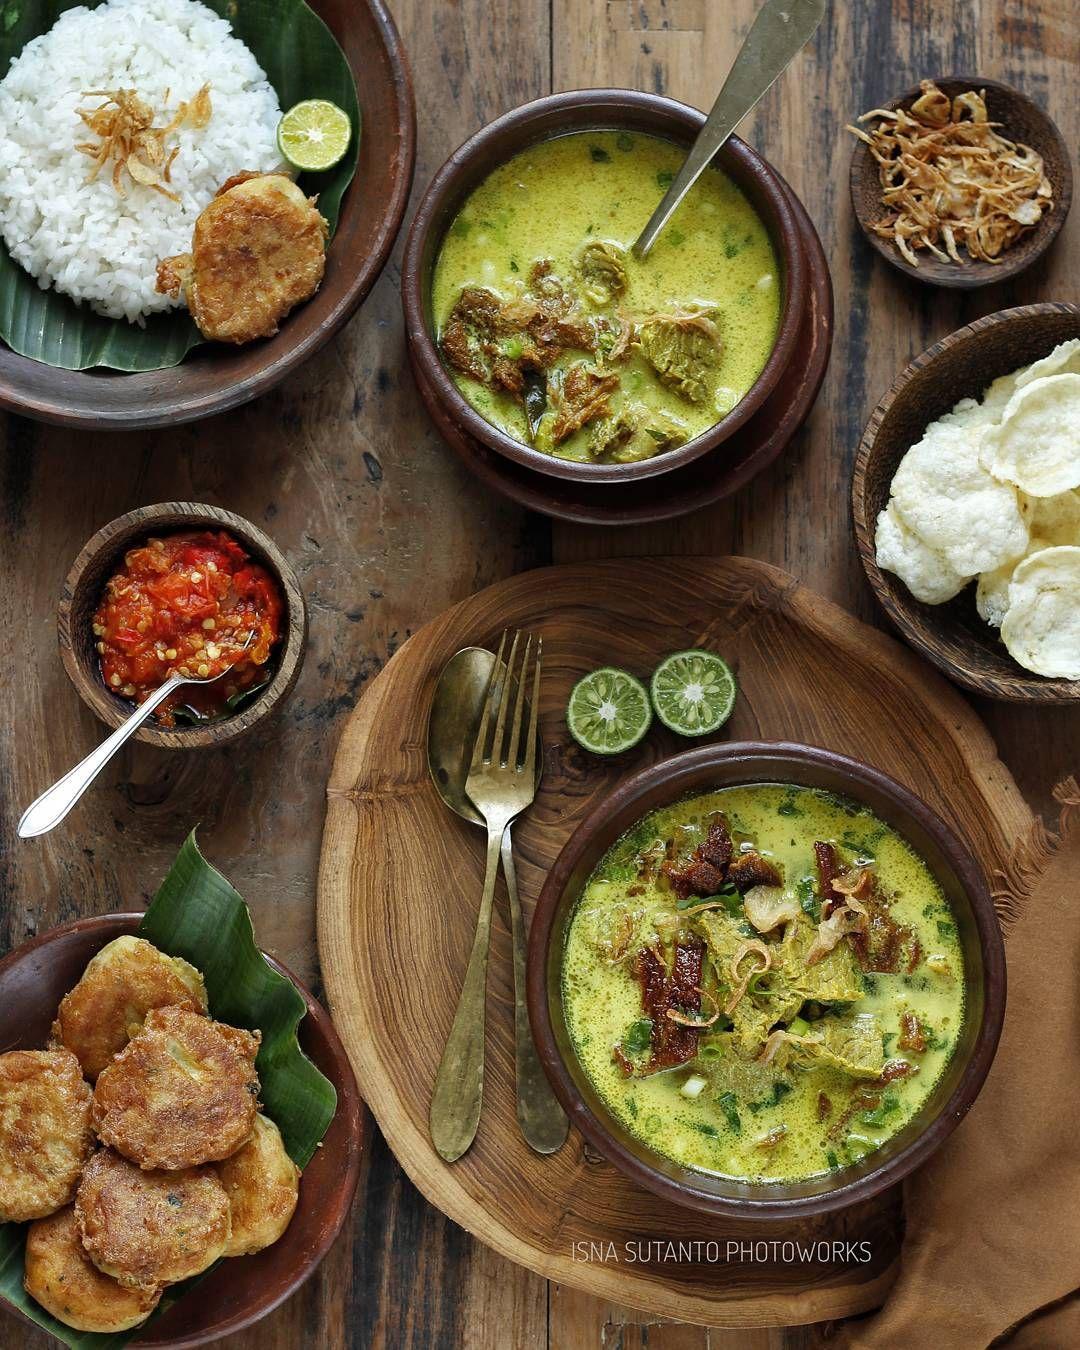 Met Siaaaang Hepi Weken Kota Bogor Terkenal Dengan Wisata